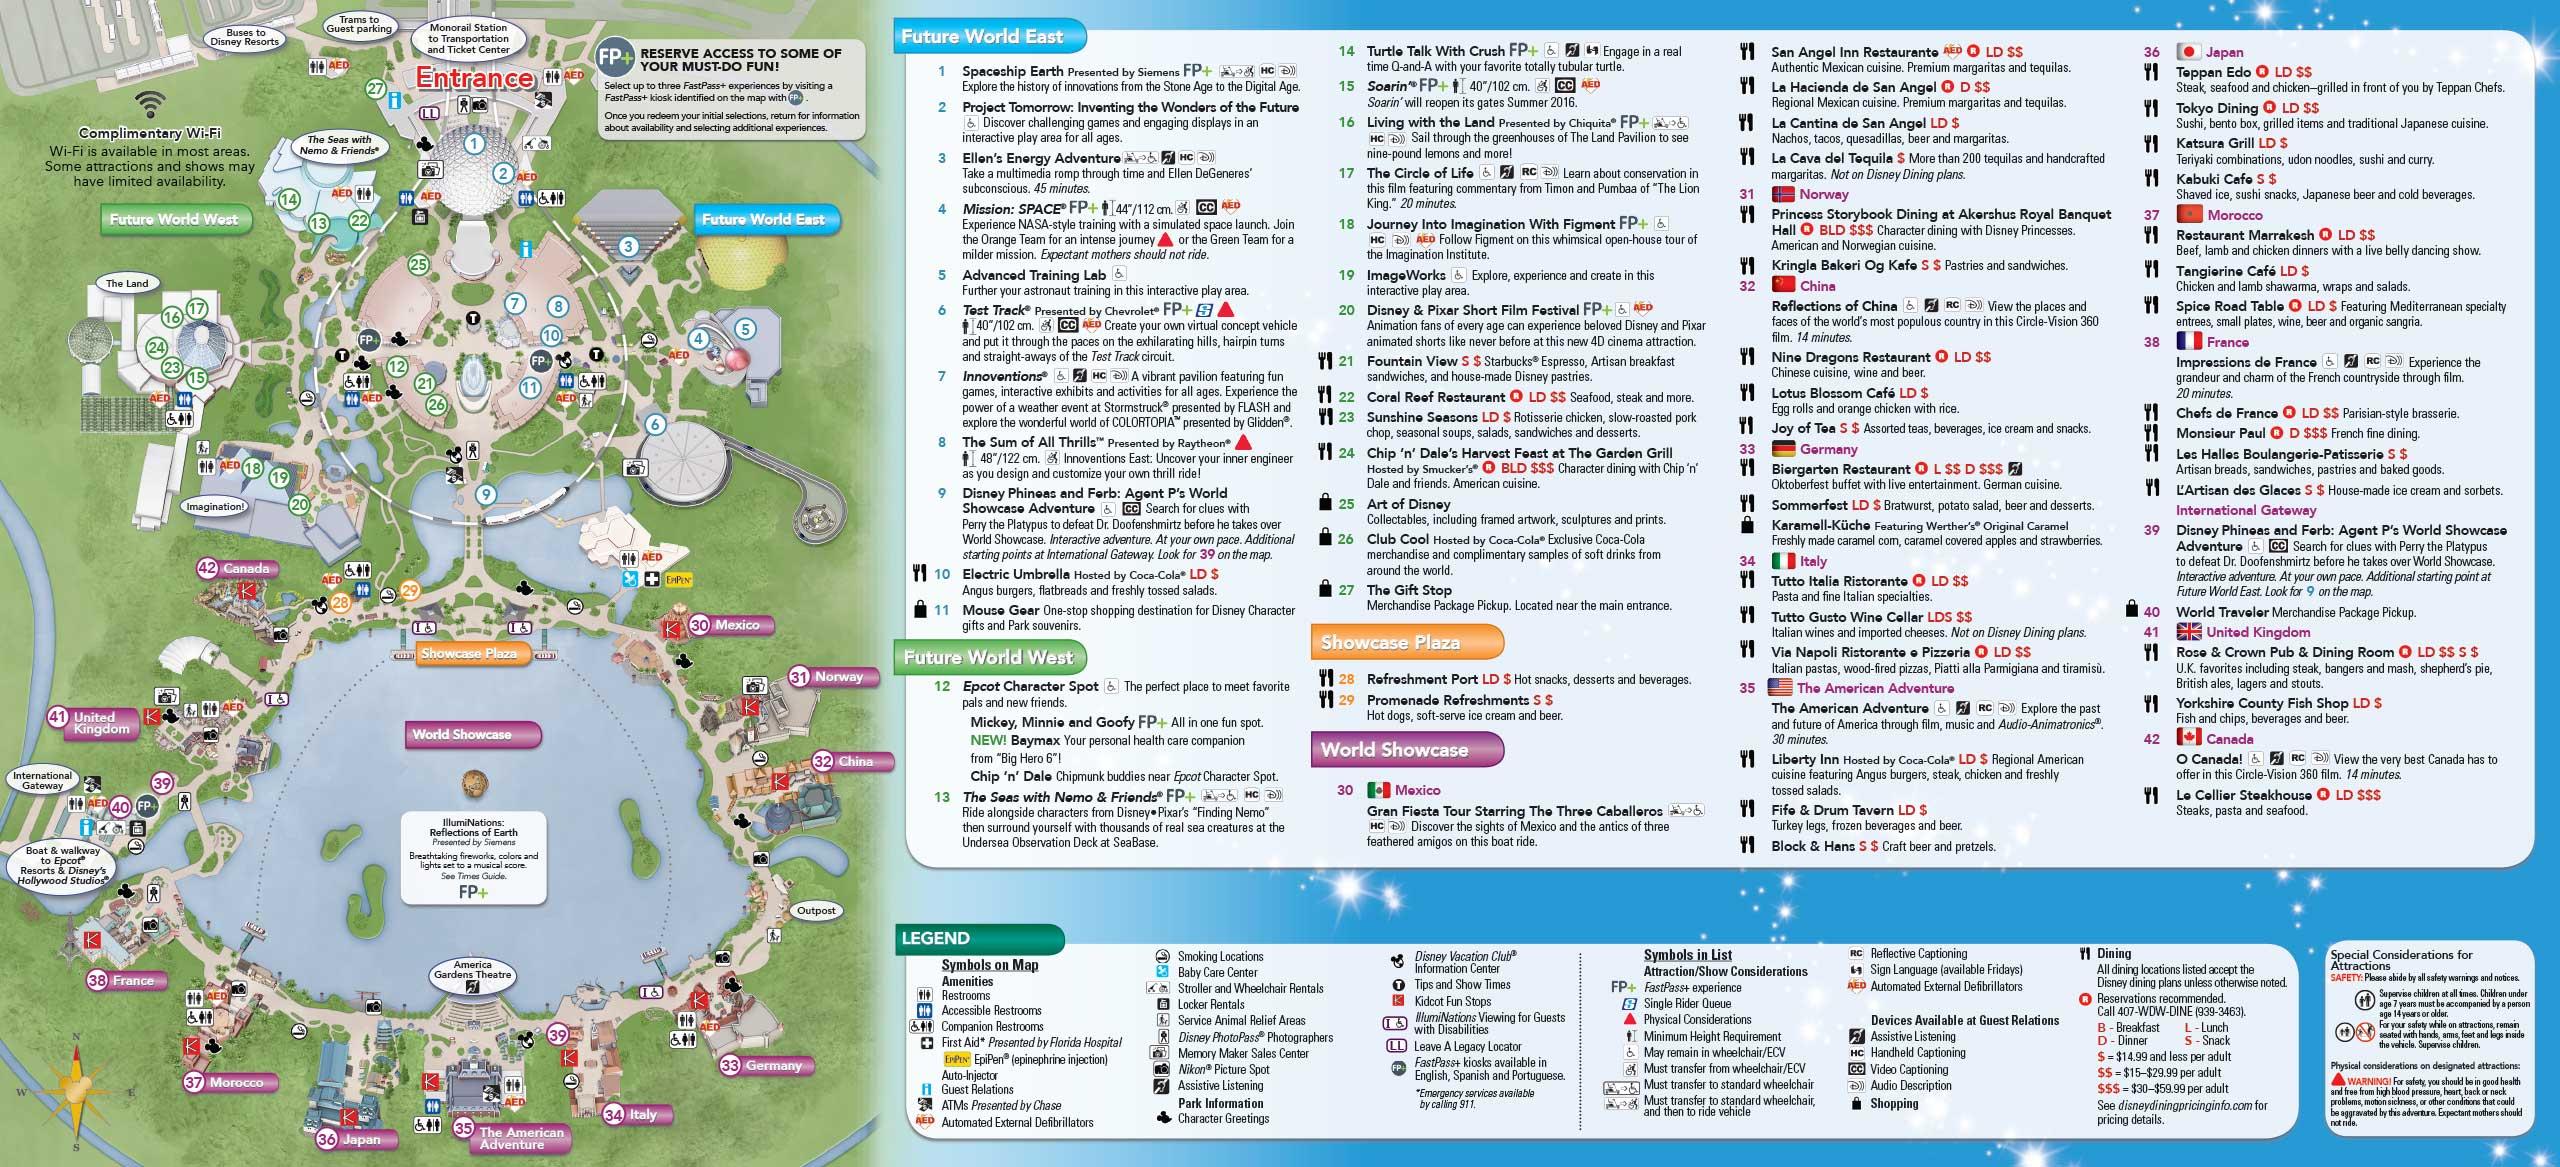 January 2016 Walt Disney World Park Maps - Photo 6 of 12